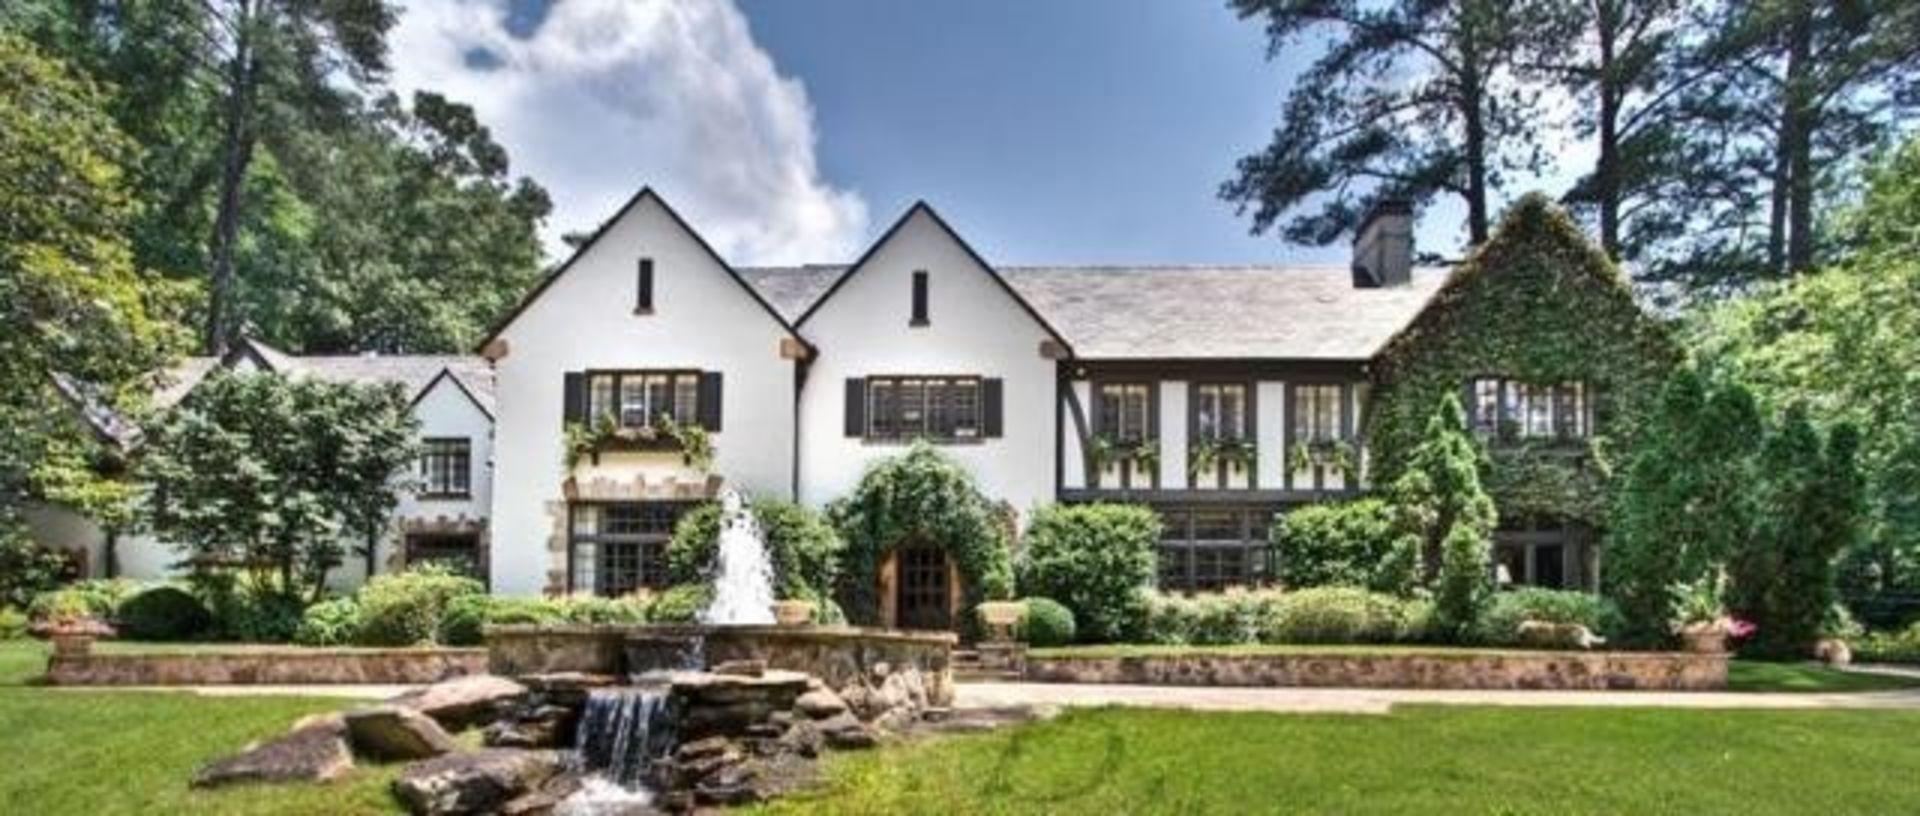 5 Gorgeous Historic Homes on the Atlanta Market Right Now!